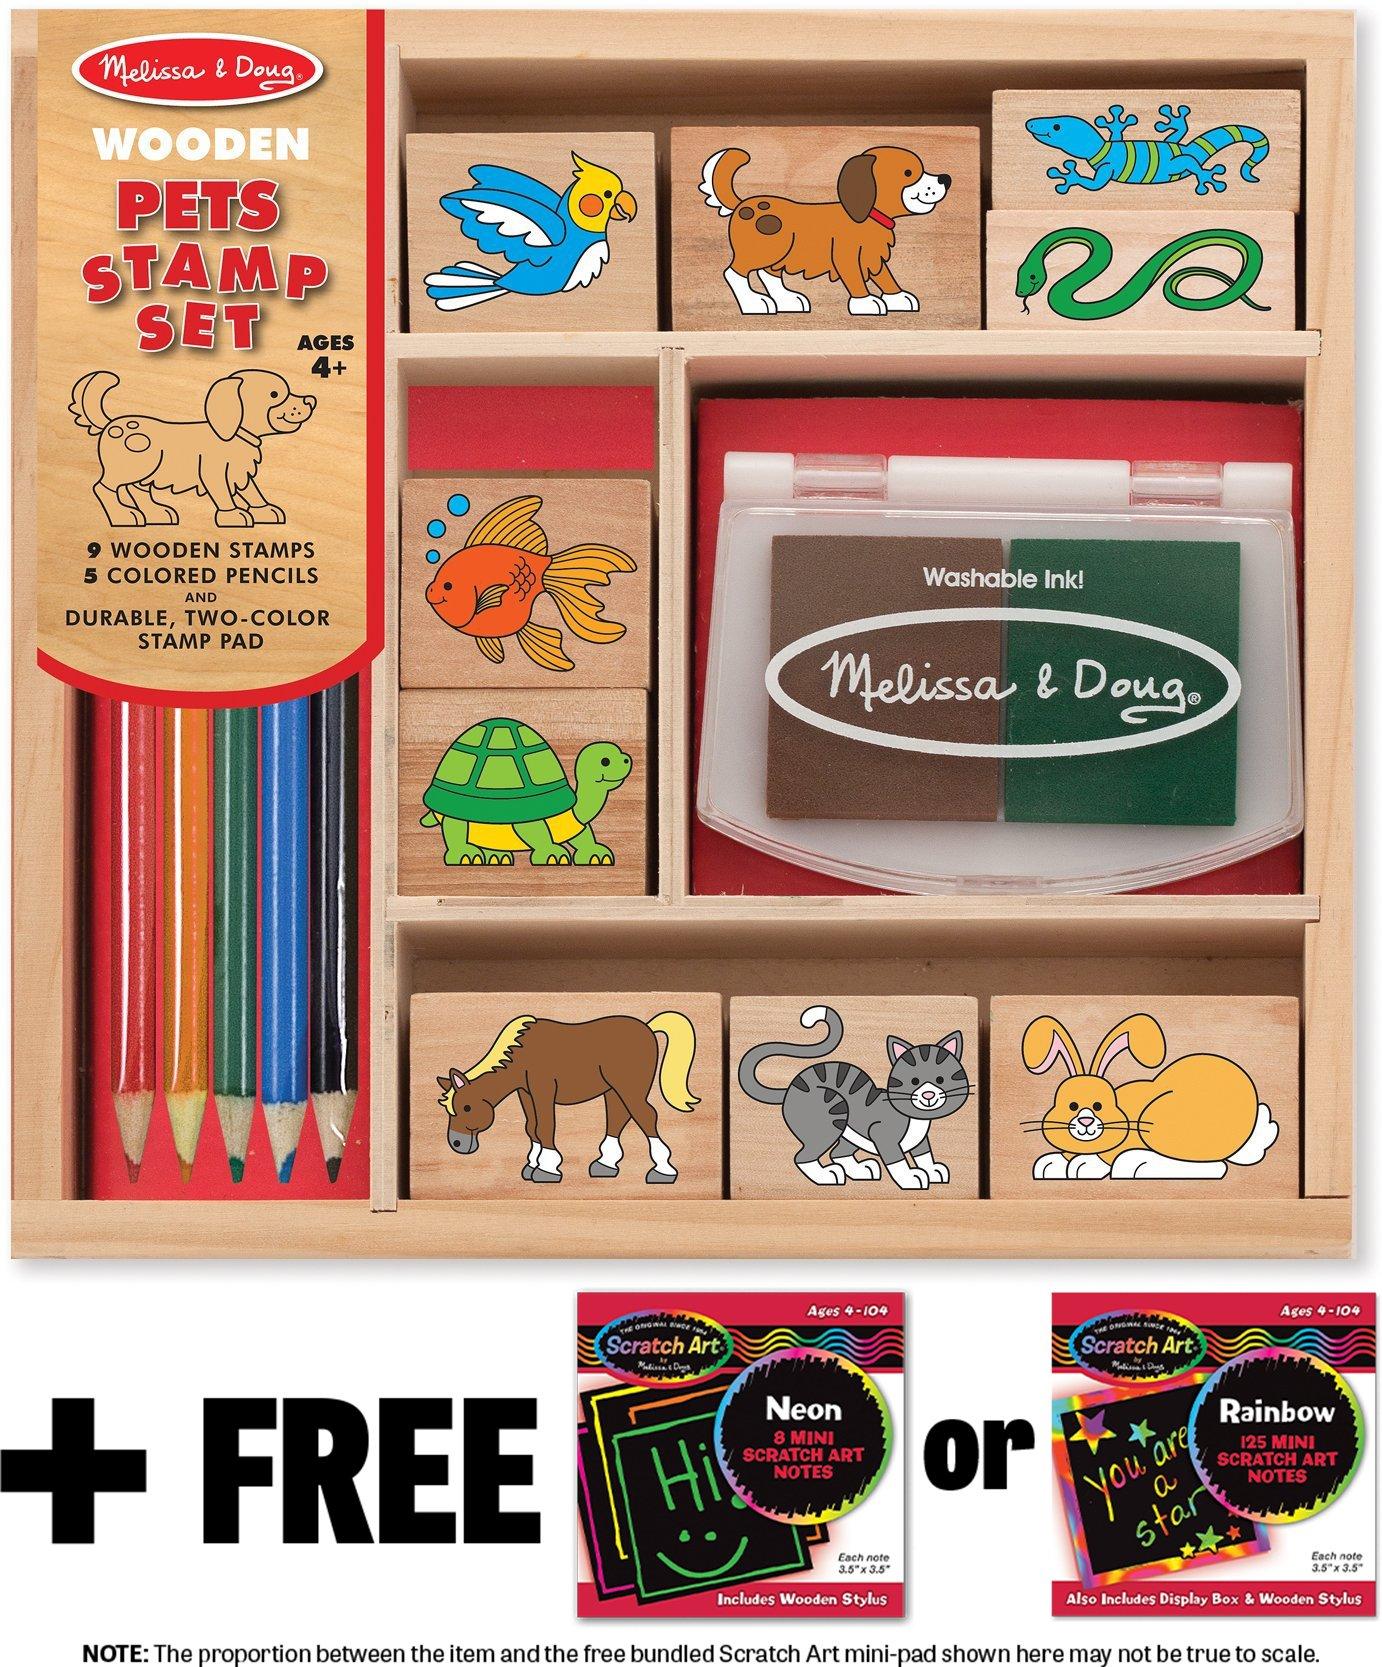 Pets: Wooden Stamp Set + FREE Melissa & Doug Scratch Art Mini-Pad Bundle [93637]